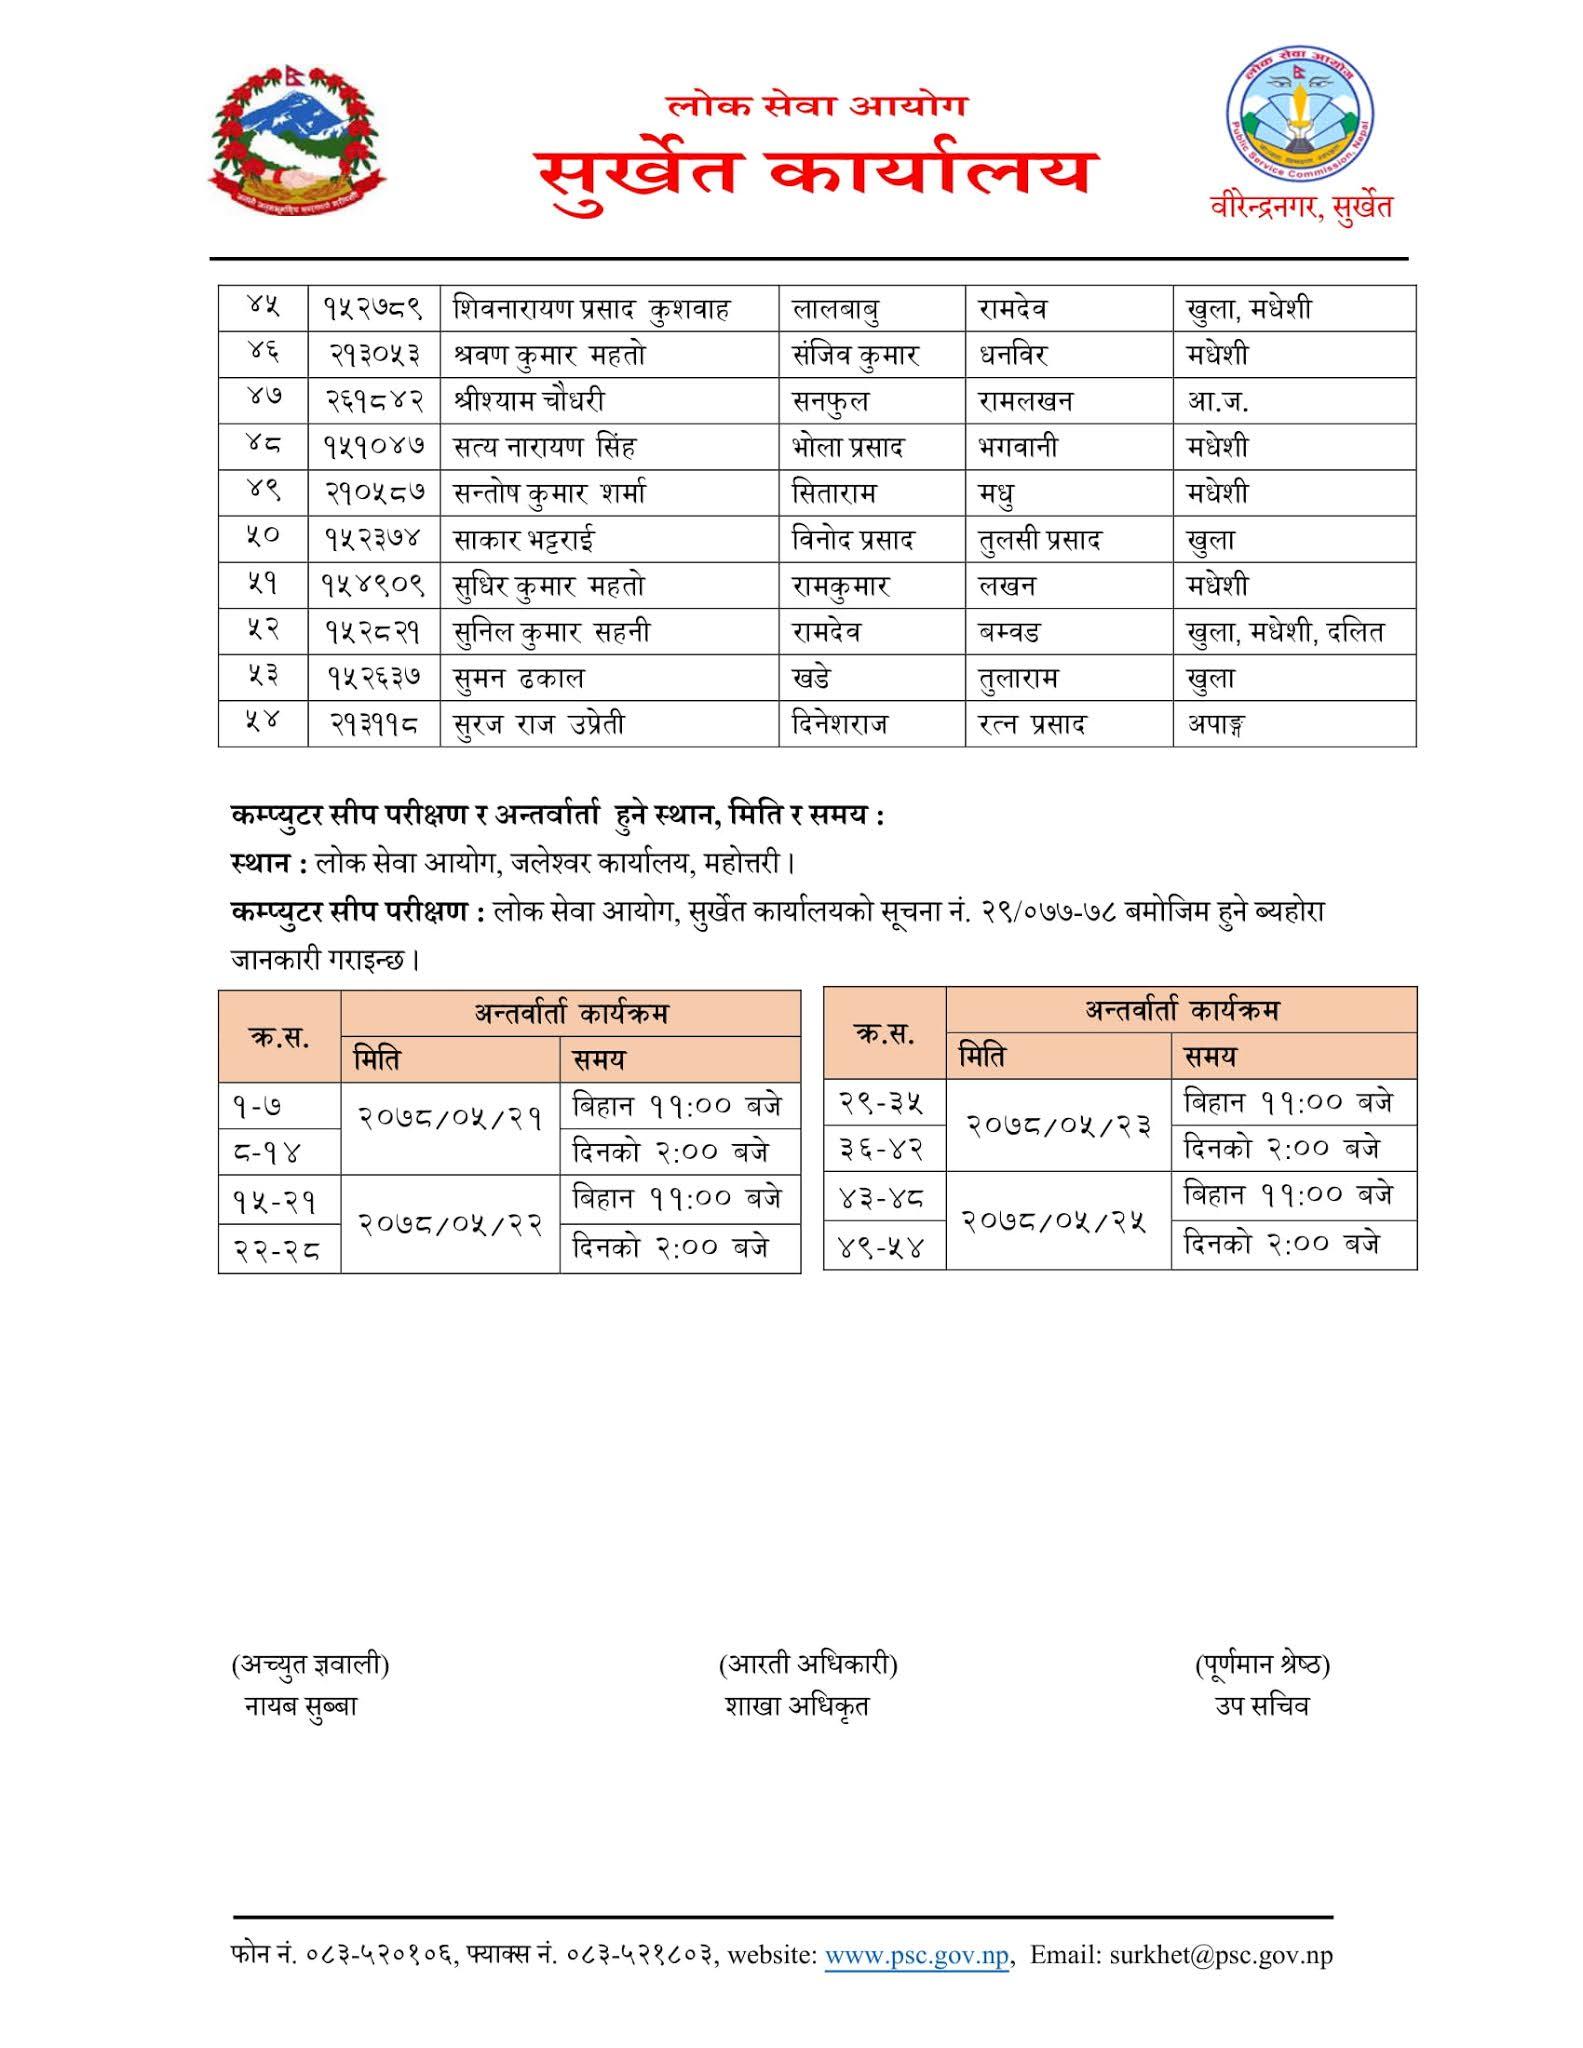 NASU Admin - Jaleshwor Lok Sewa Aayog Written Exam Result & Exam Schedule